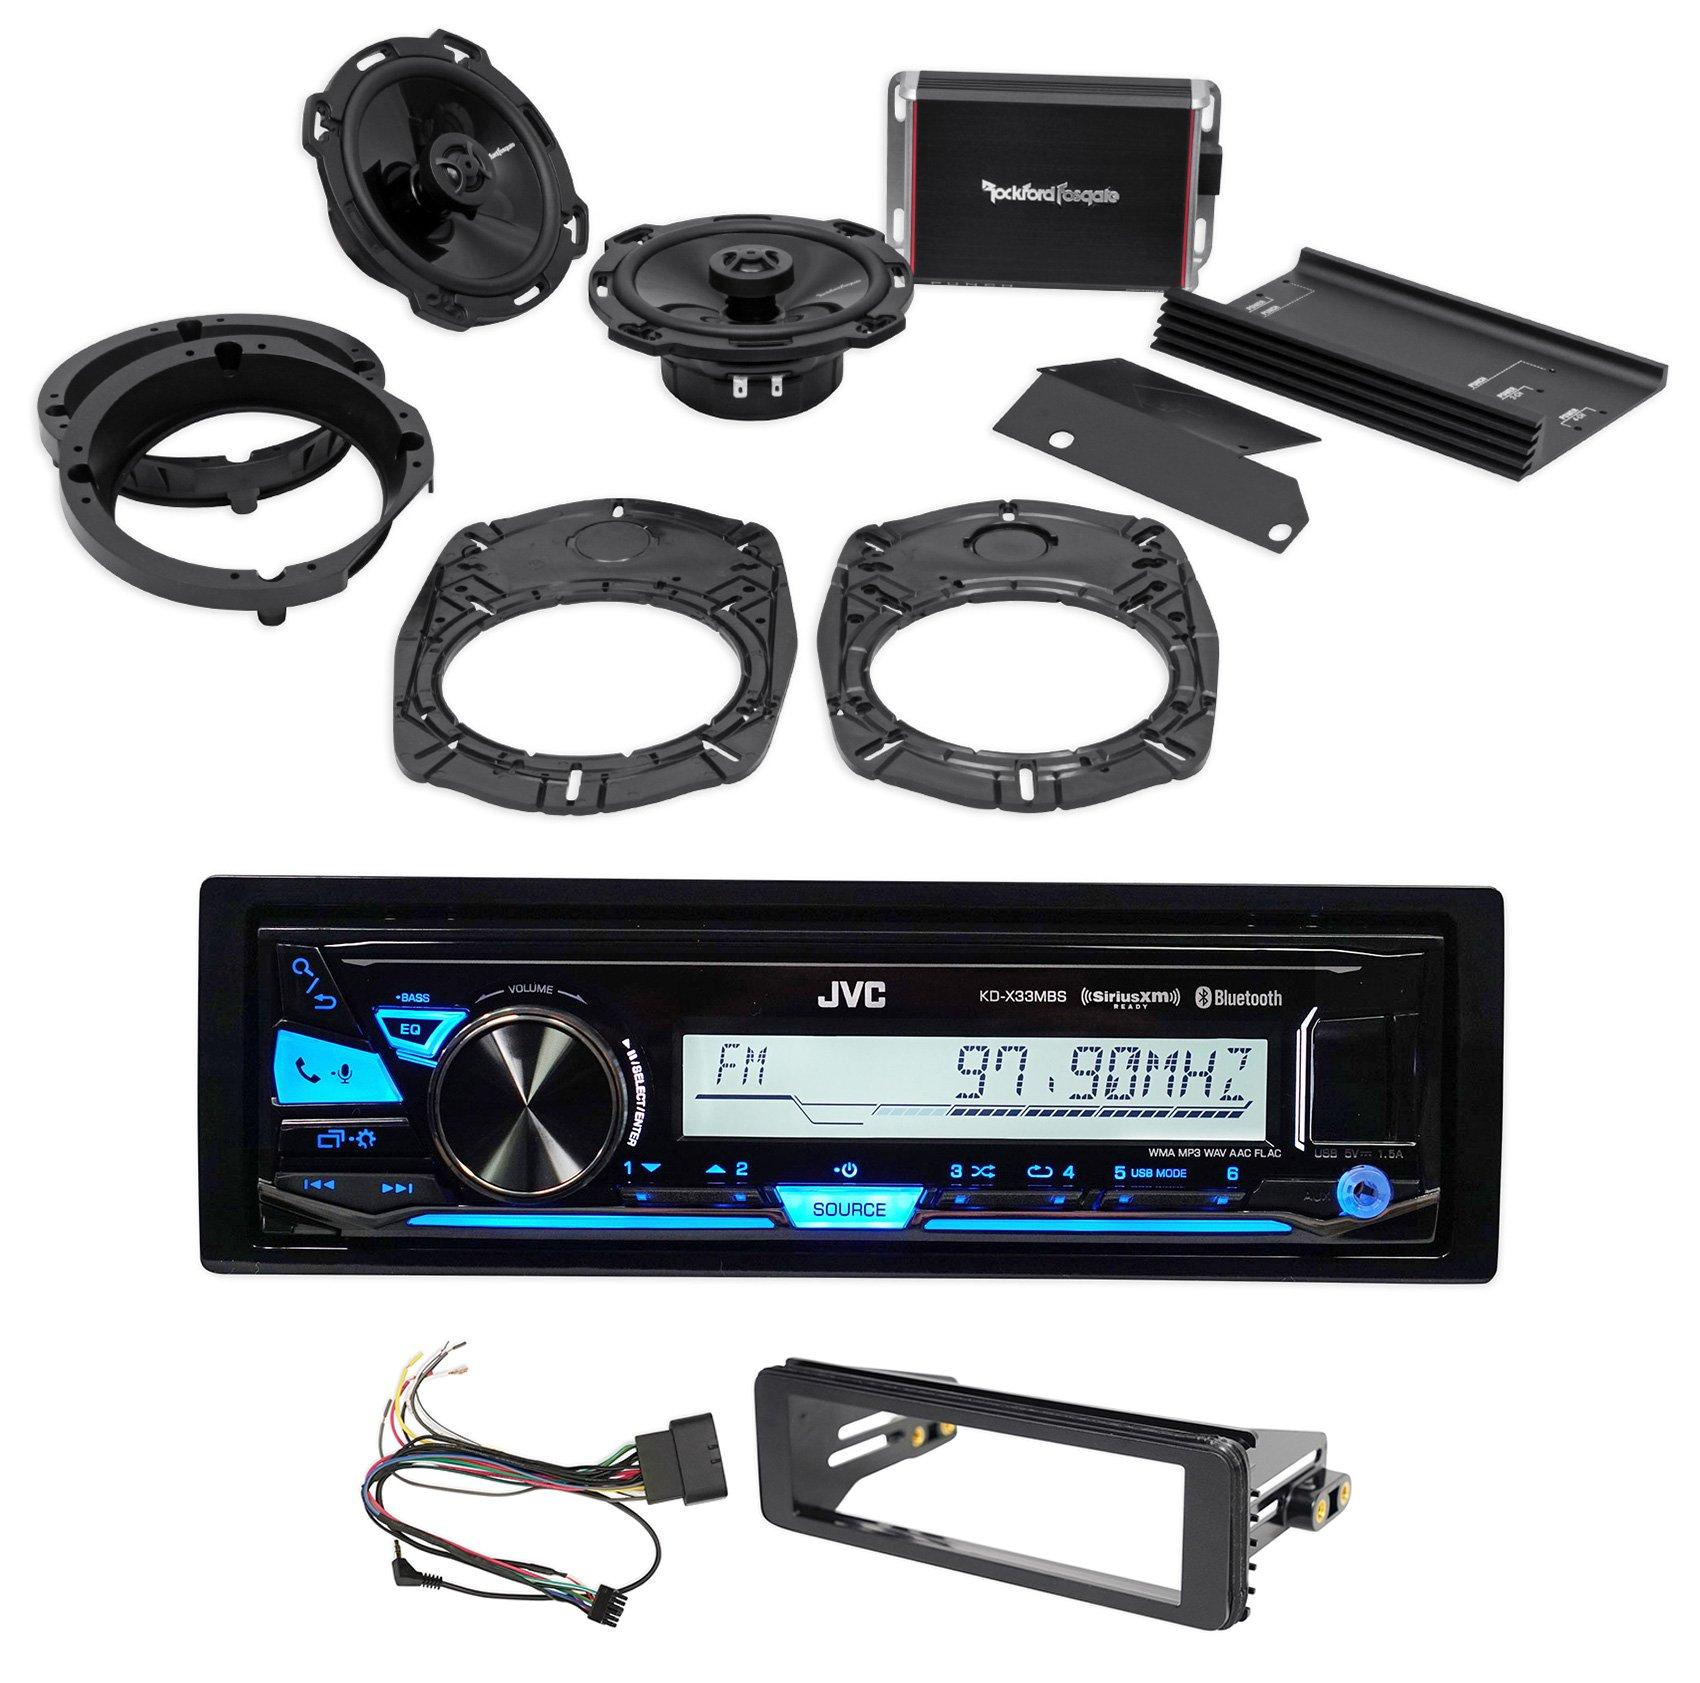 Rockford Fosgate HD9813-PKIT 98-13 Harley-Davidson 6'' Speakers+Amp+JVC Receiver by Rockford Fosgate